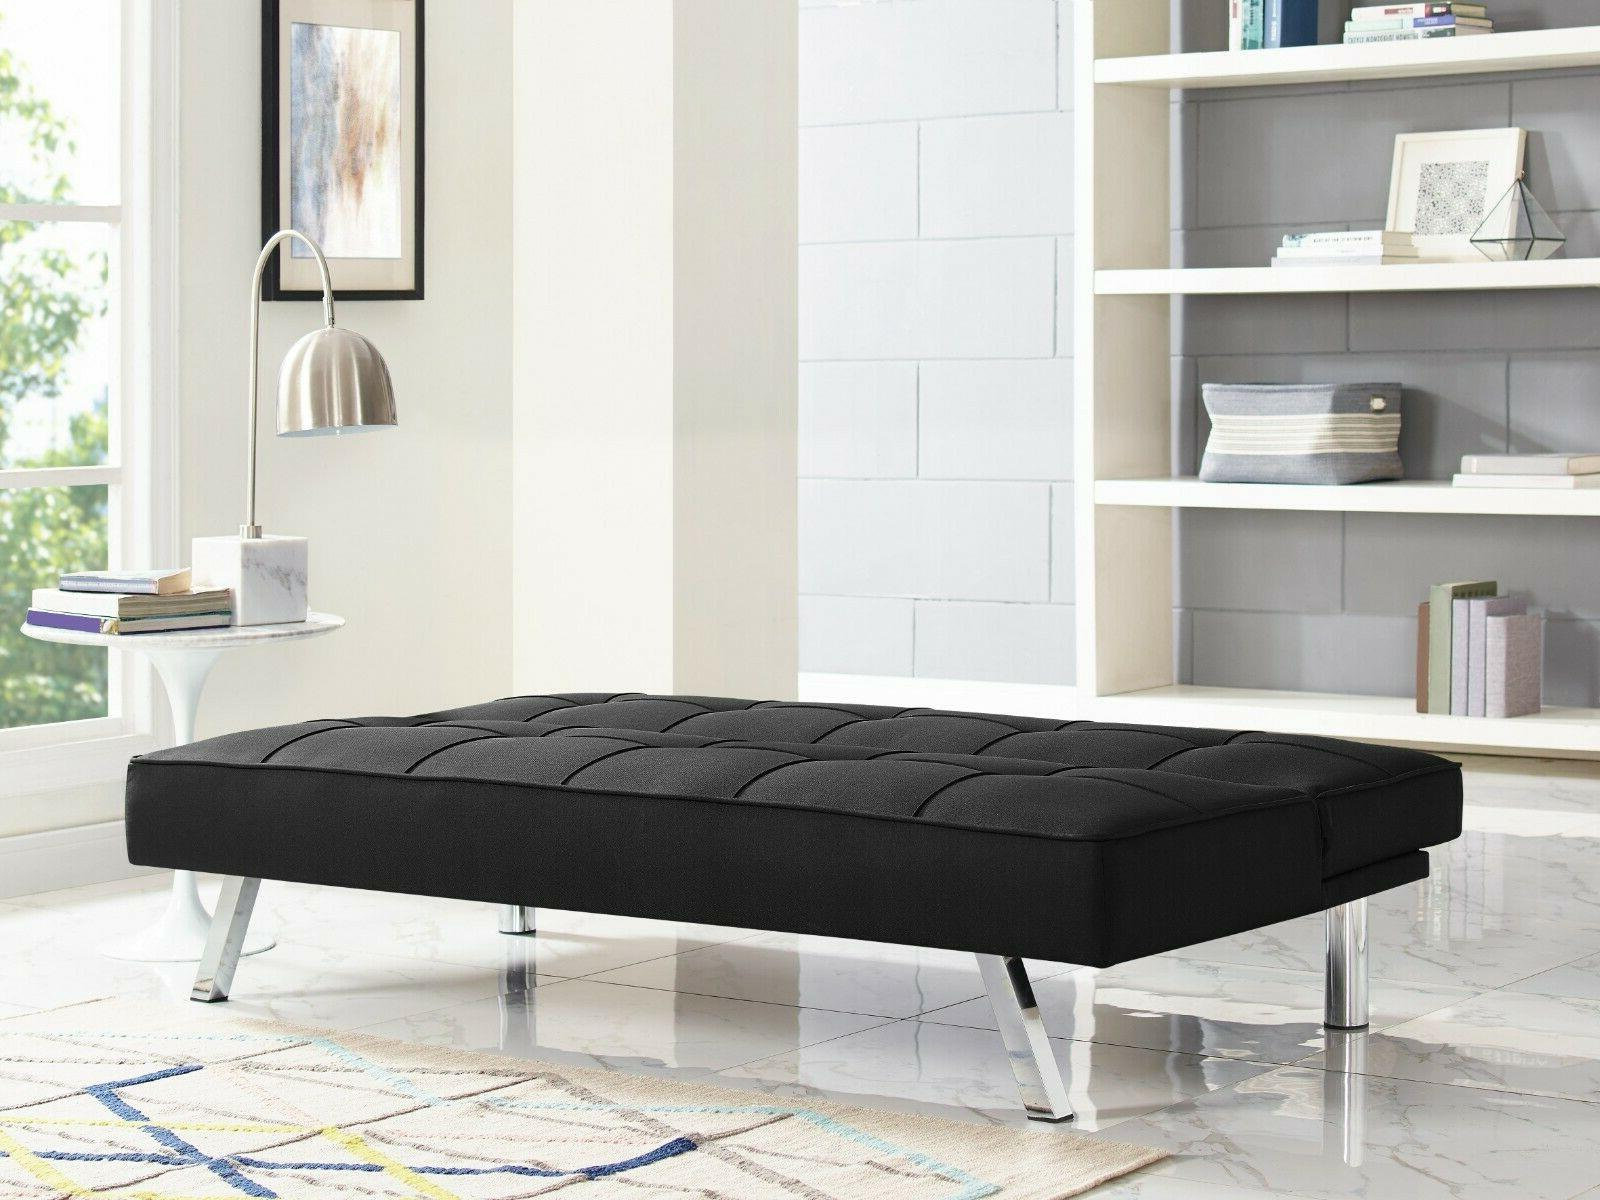 Chelsea Fabric futon tufted metal dense chic